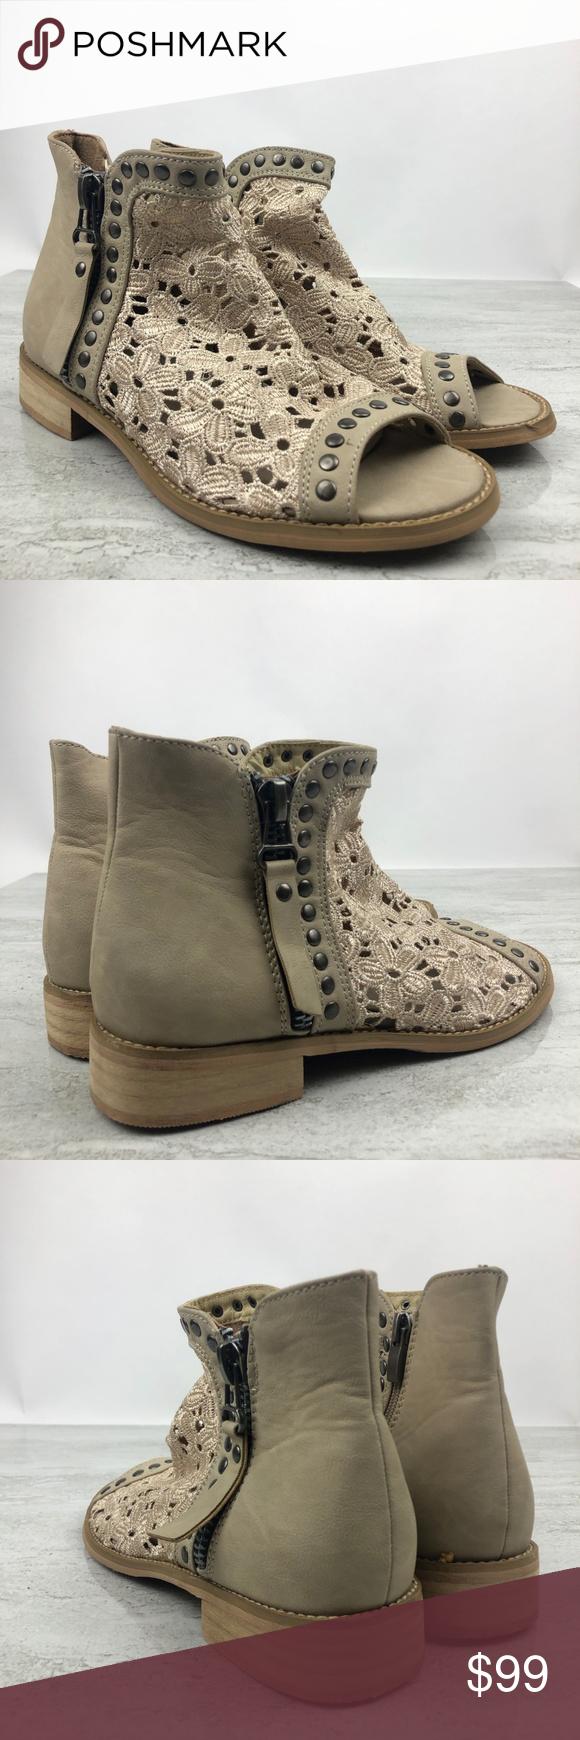 Vanessa Wu Cream Lace Peep Toe Ankle Boots - TK Maxx